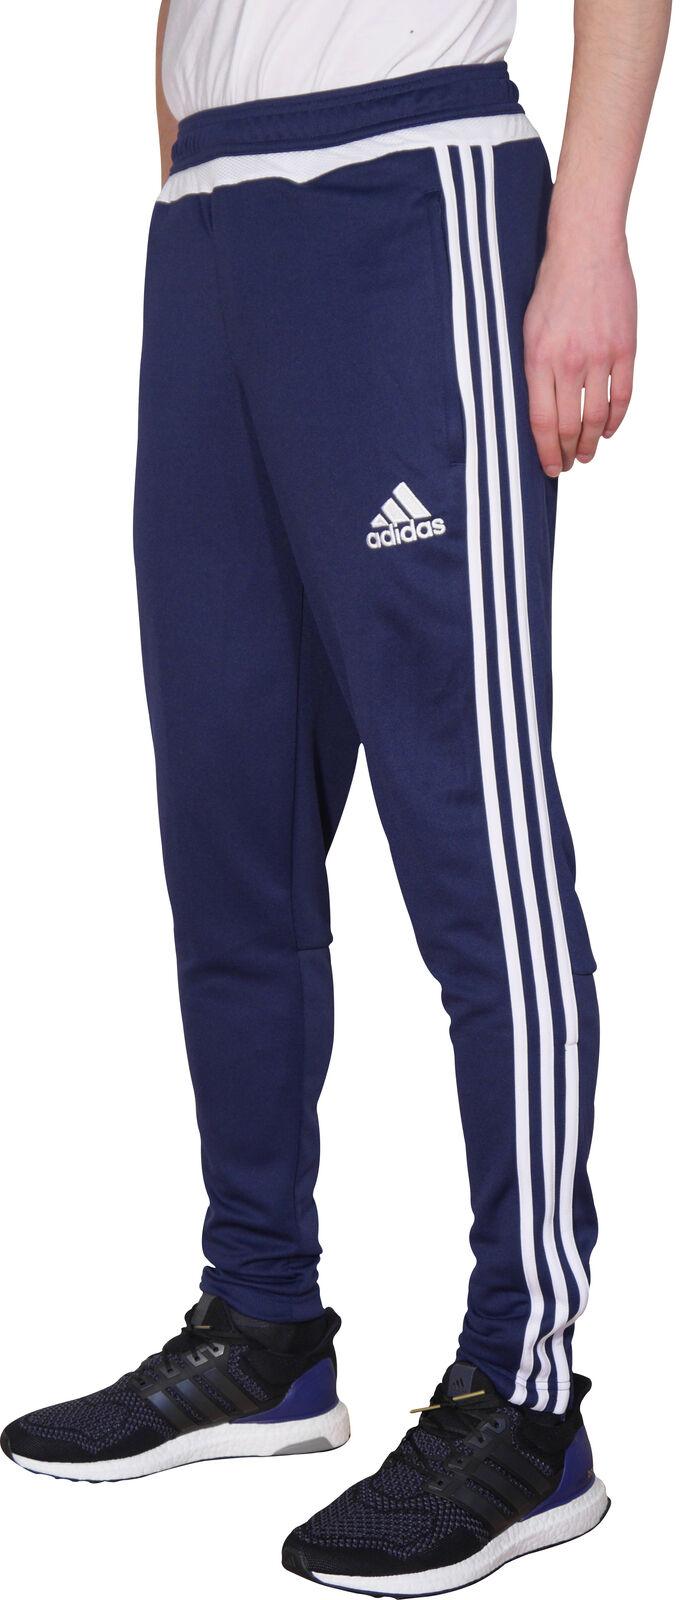 Adidas Tiro15 Mens Skinny Skinnies Football Slim Tapered Training Pants